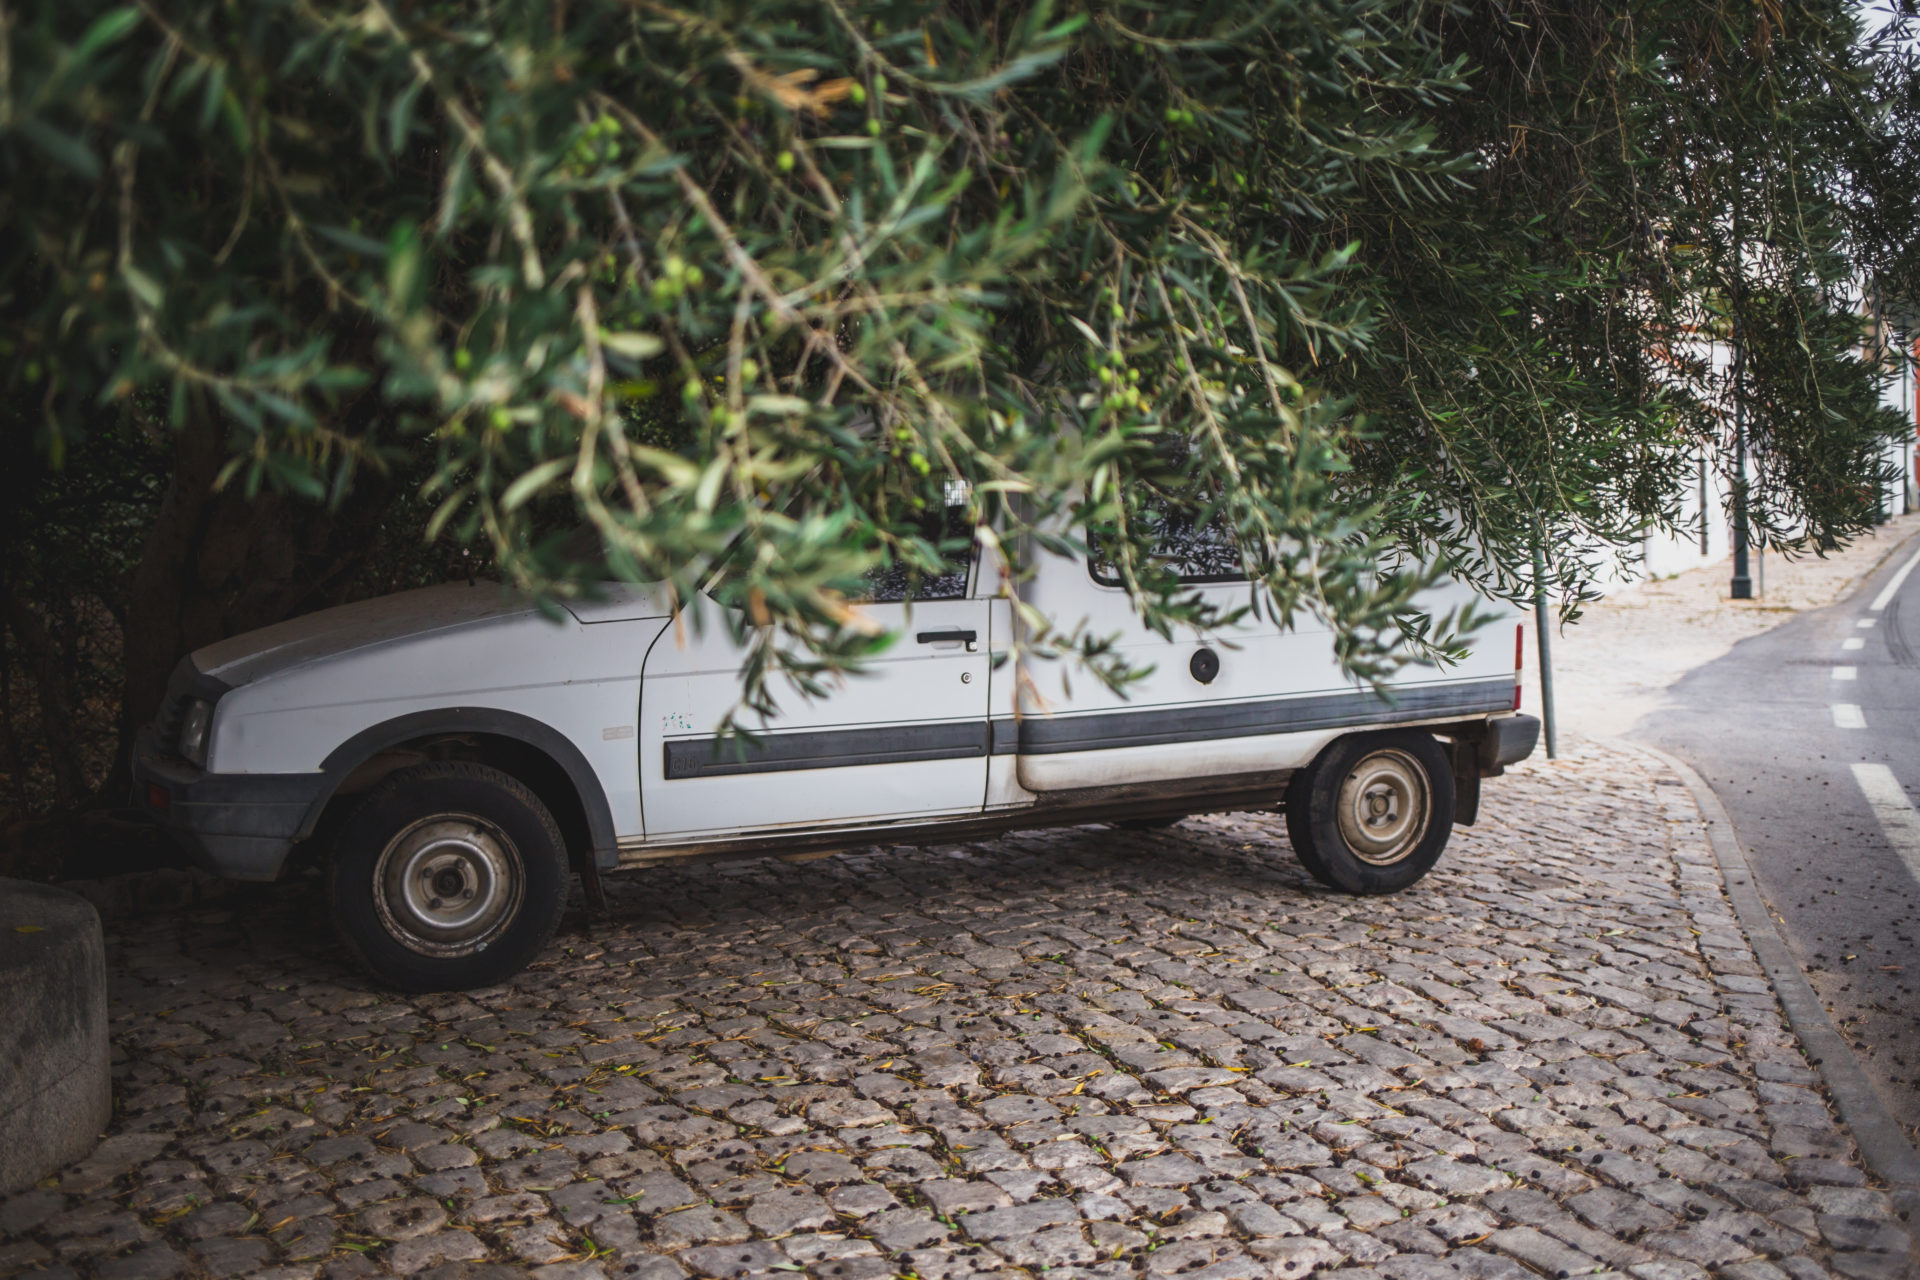 Portugal_Algarve_Auto_7181_Carolin-Weinkopf